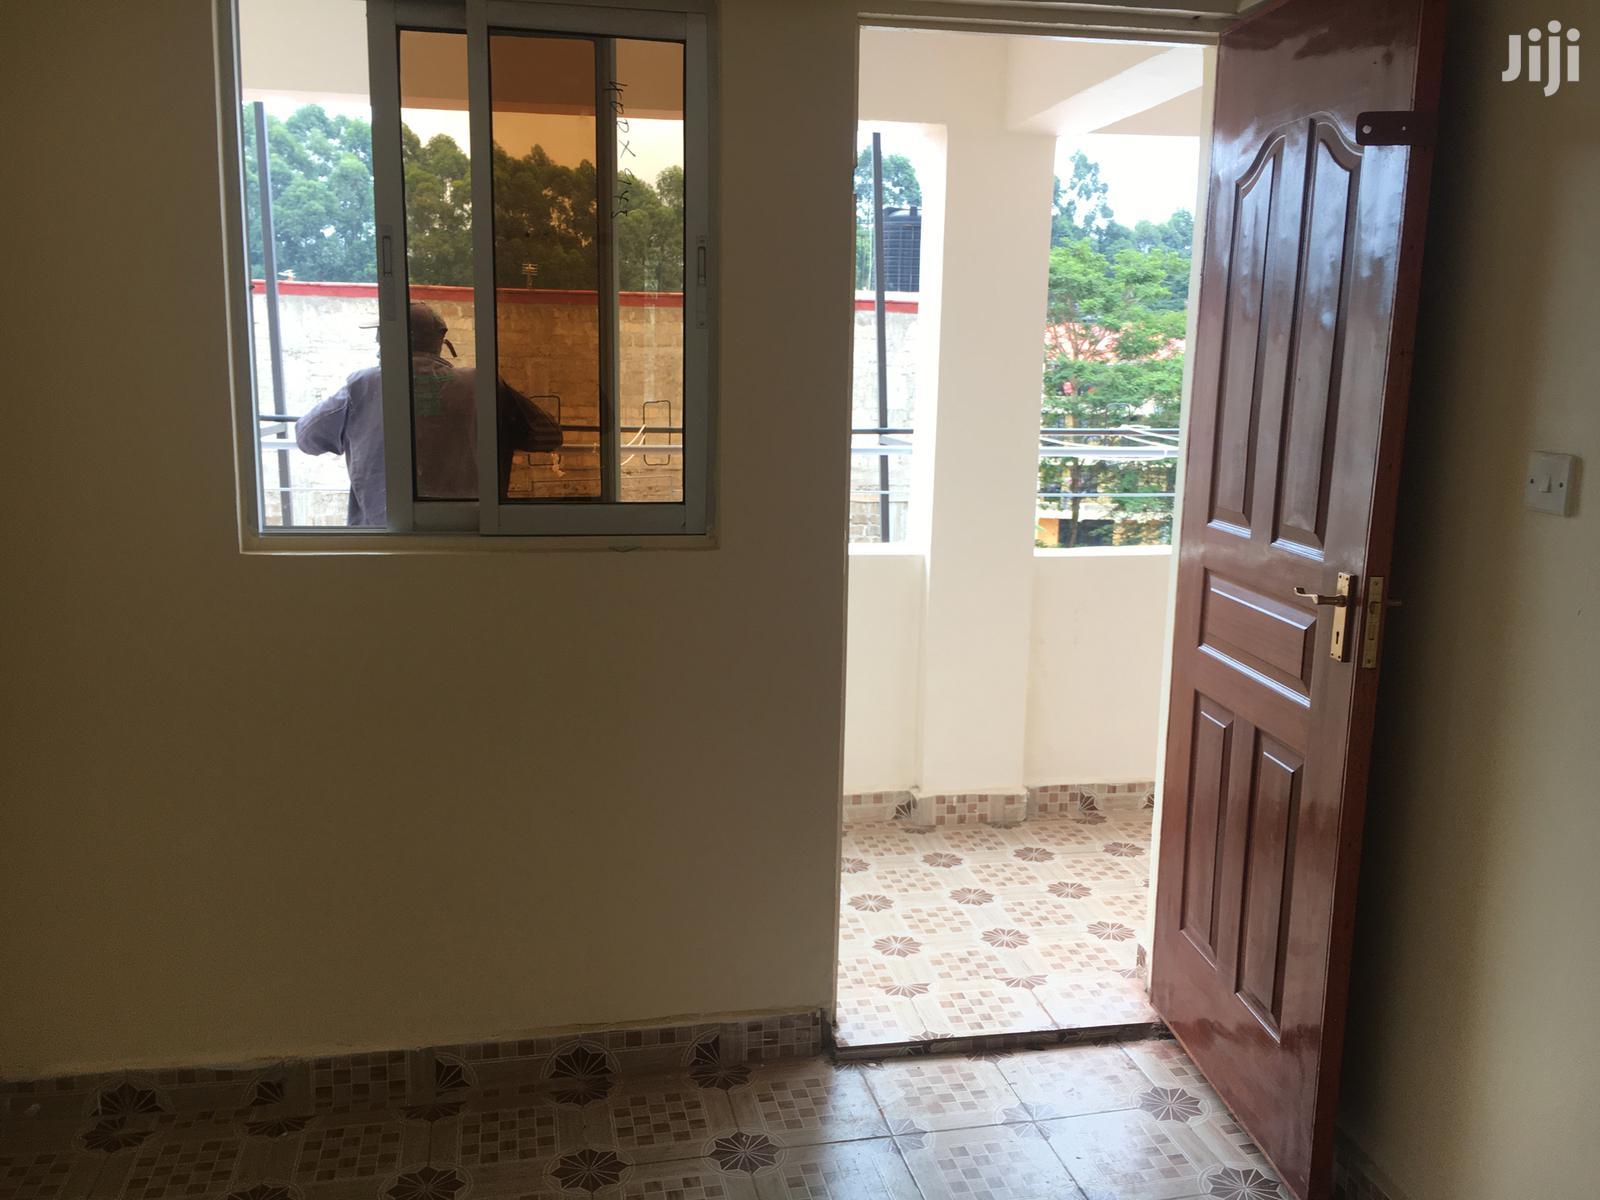 Arcadia Apartments Nkubu (Bed Sitter) | Houses & Apartments For Rent for sale in Nkuene, Meru, Kenya